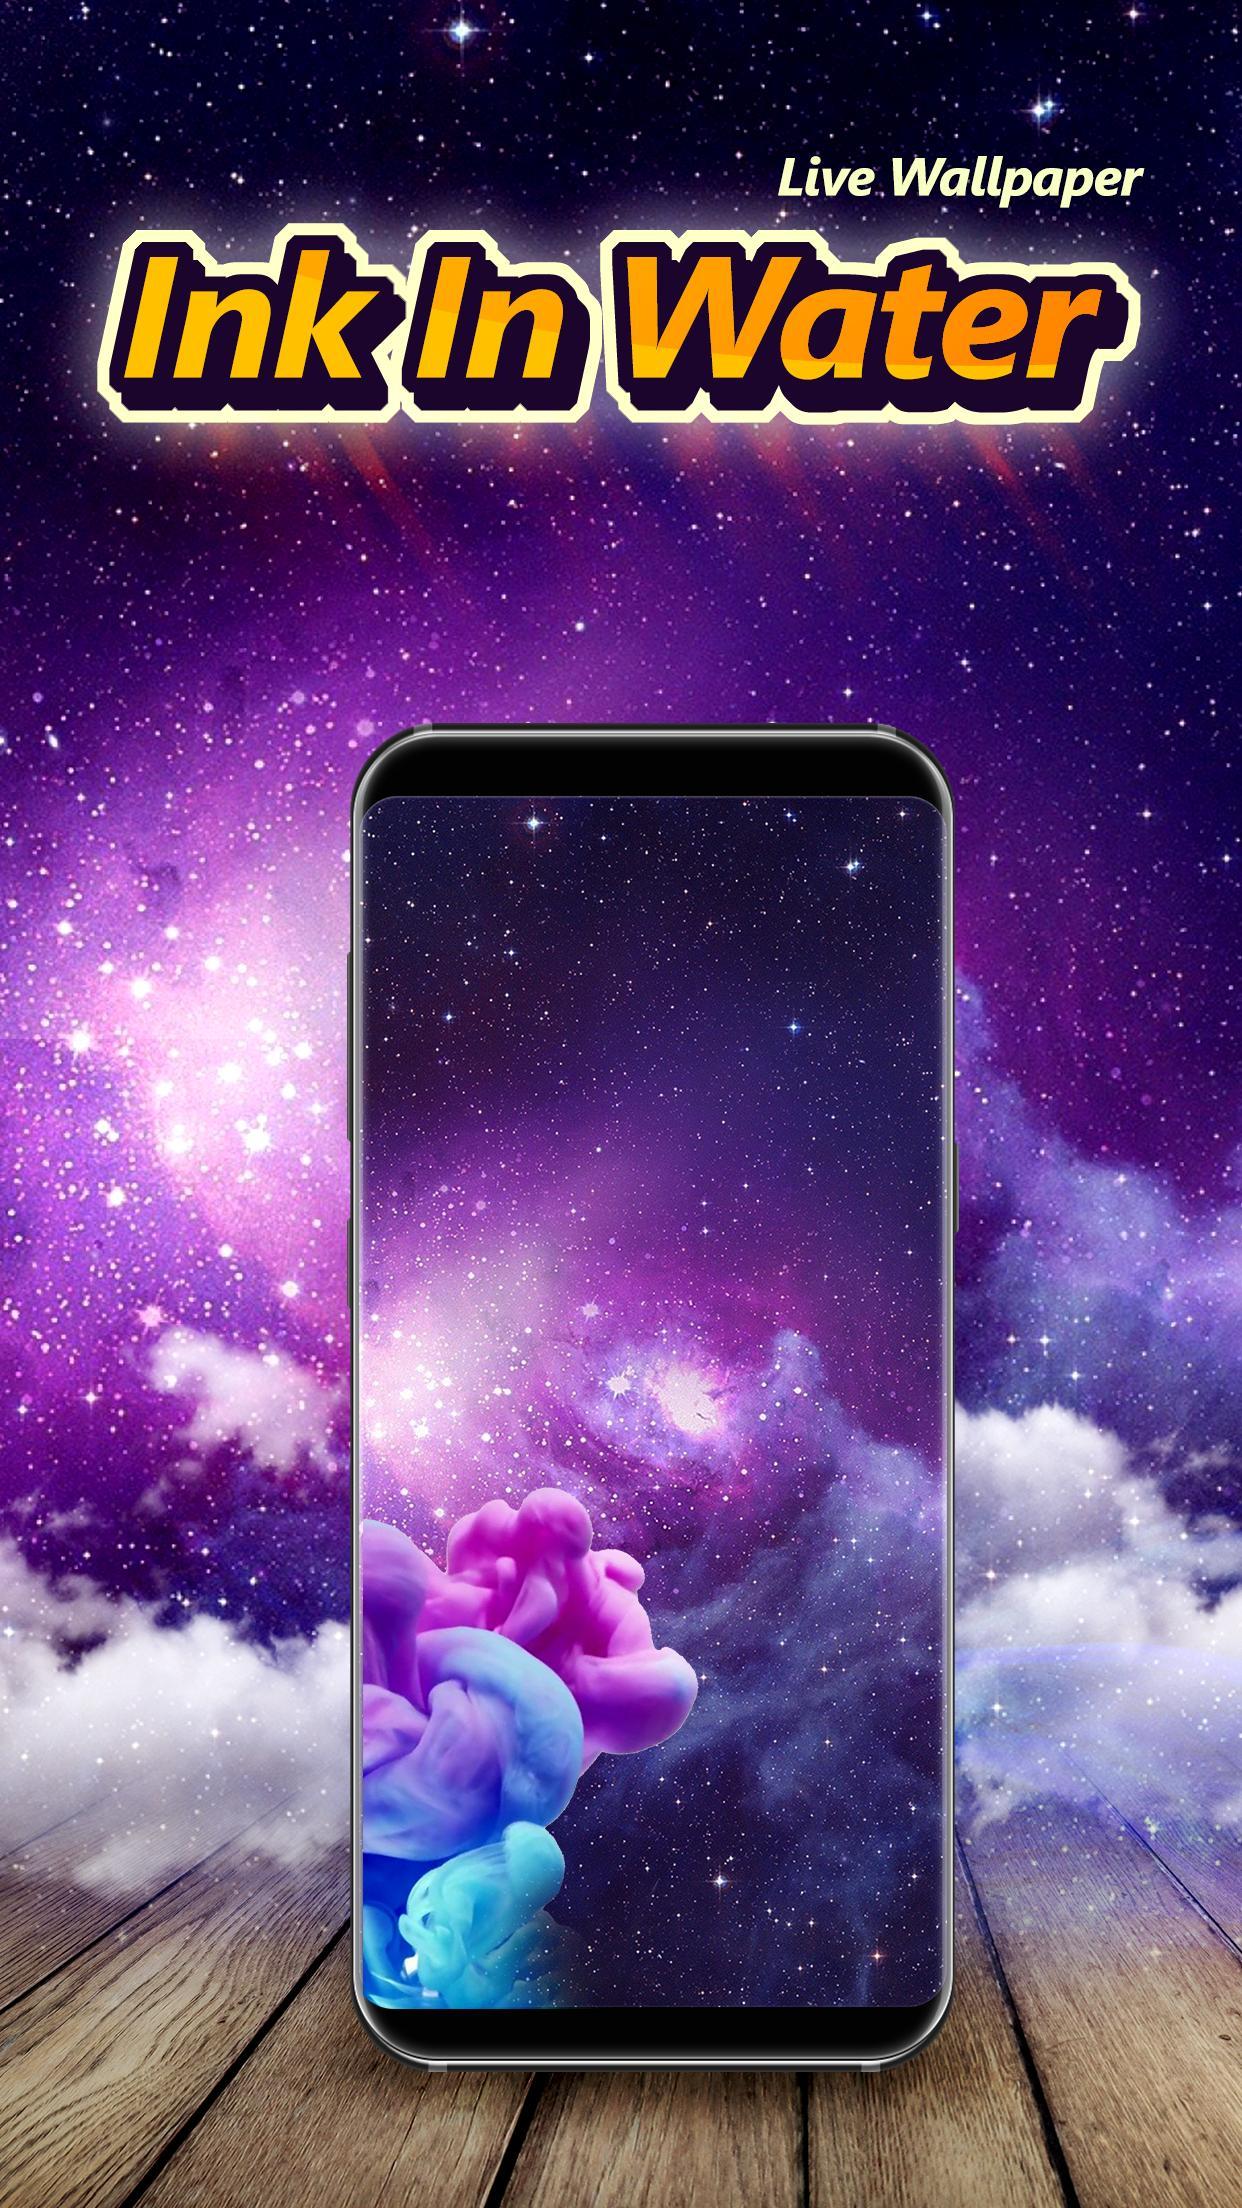 Galaxy S8 Sfondi Animati For Android Apk Download